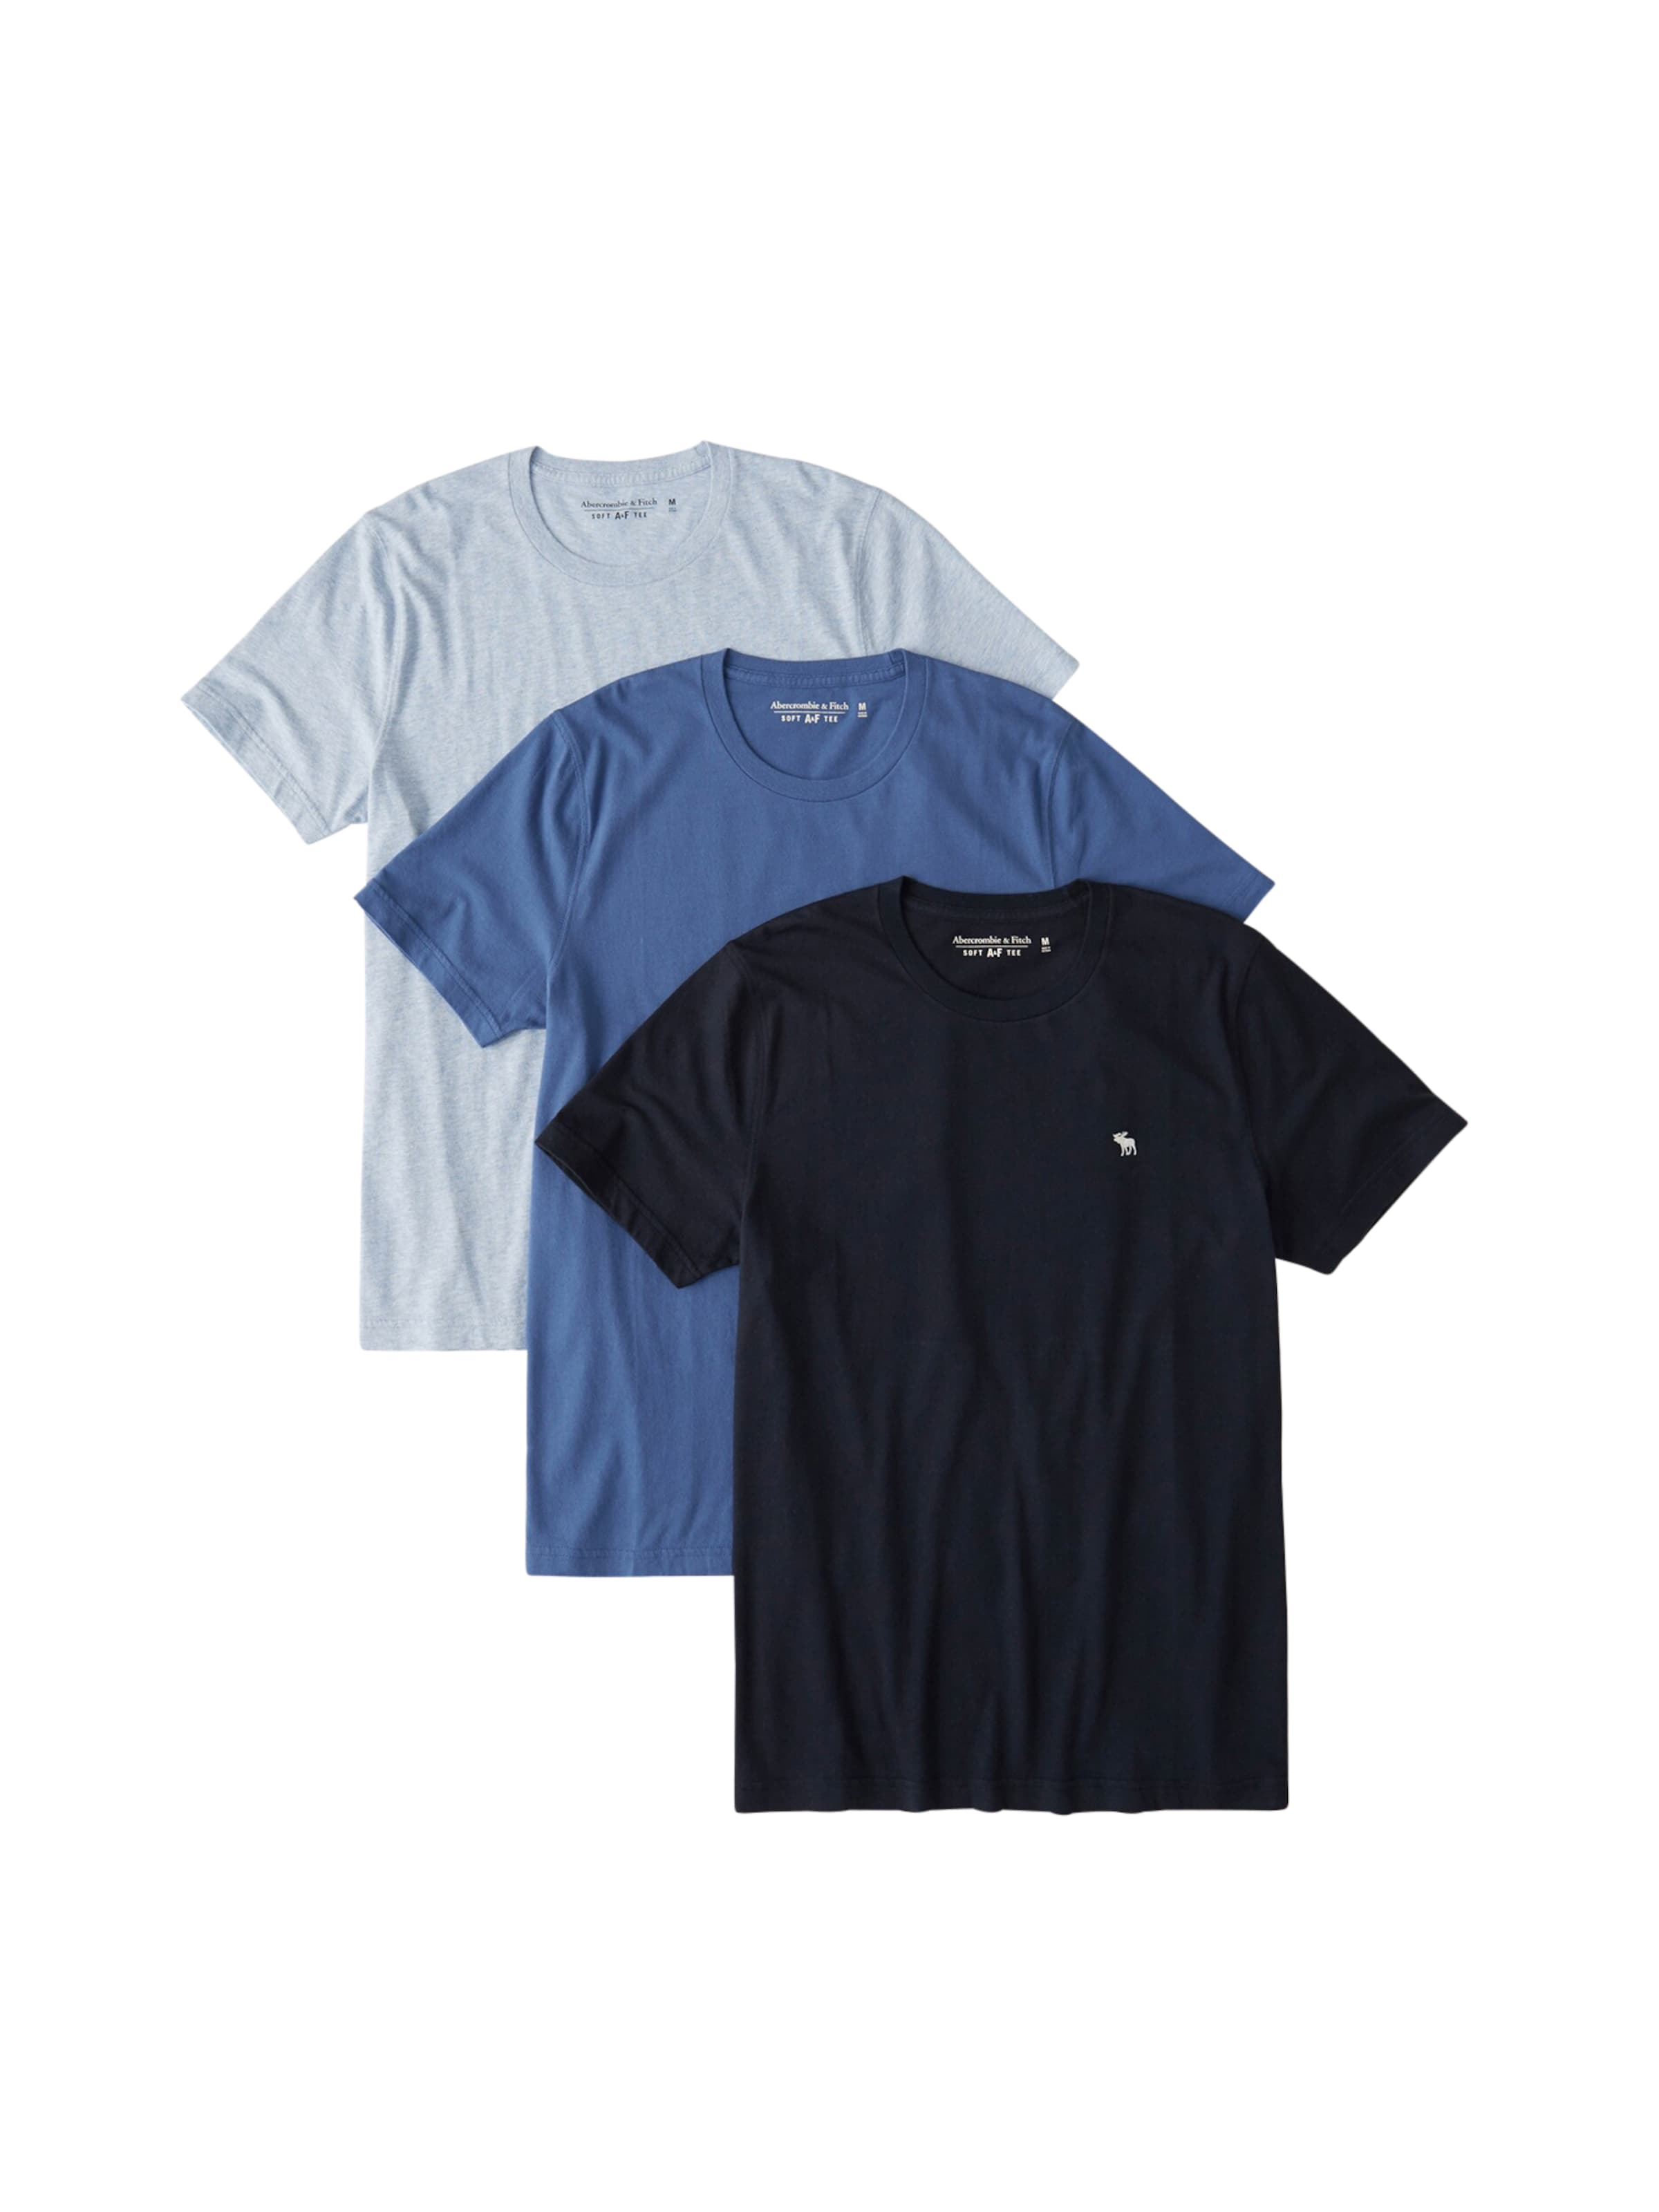 T BleuClair Anthracite Abercrombieamp; Fitch En shirt lJ1KcF